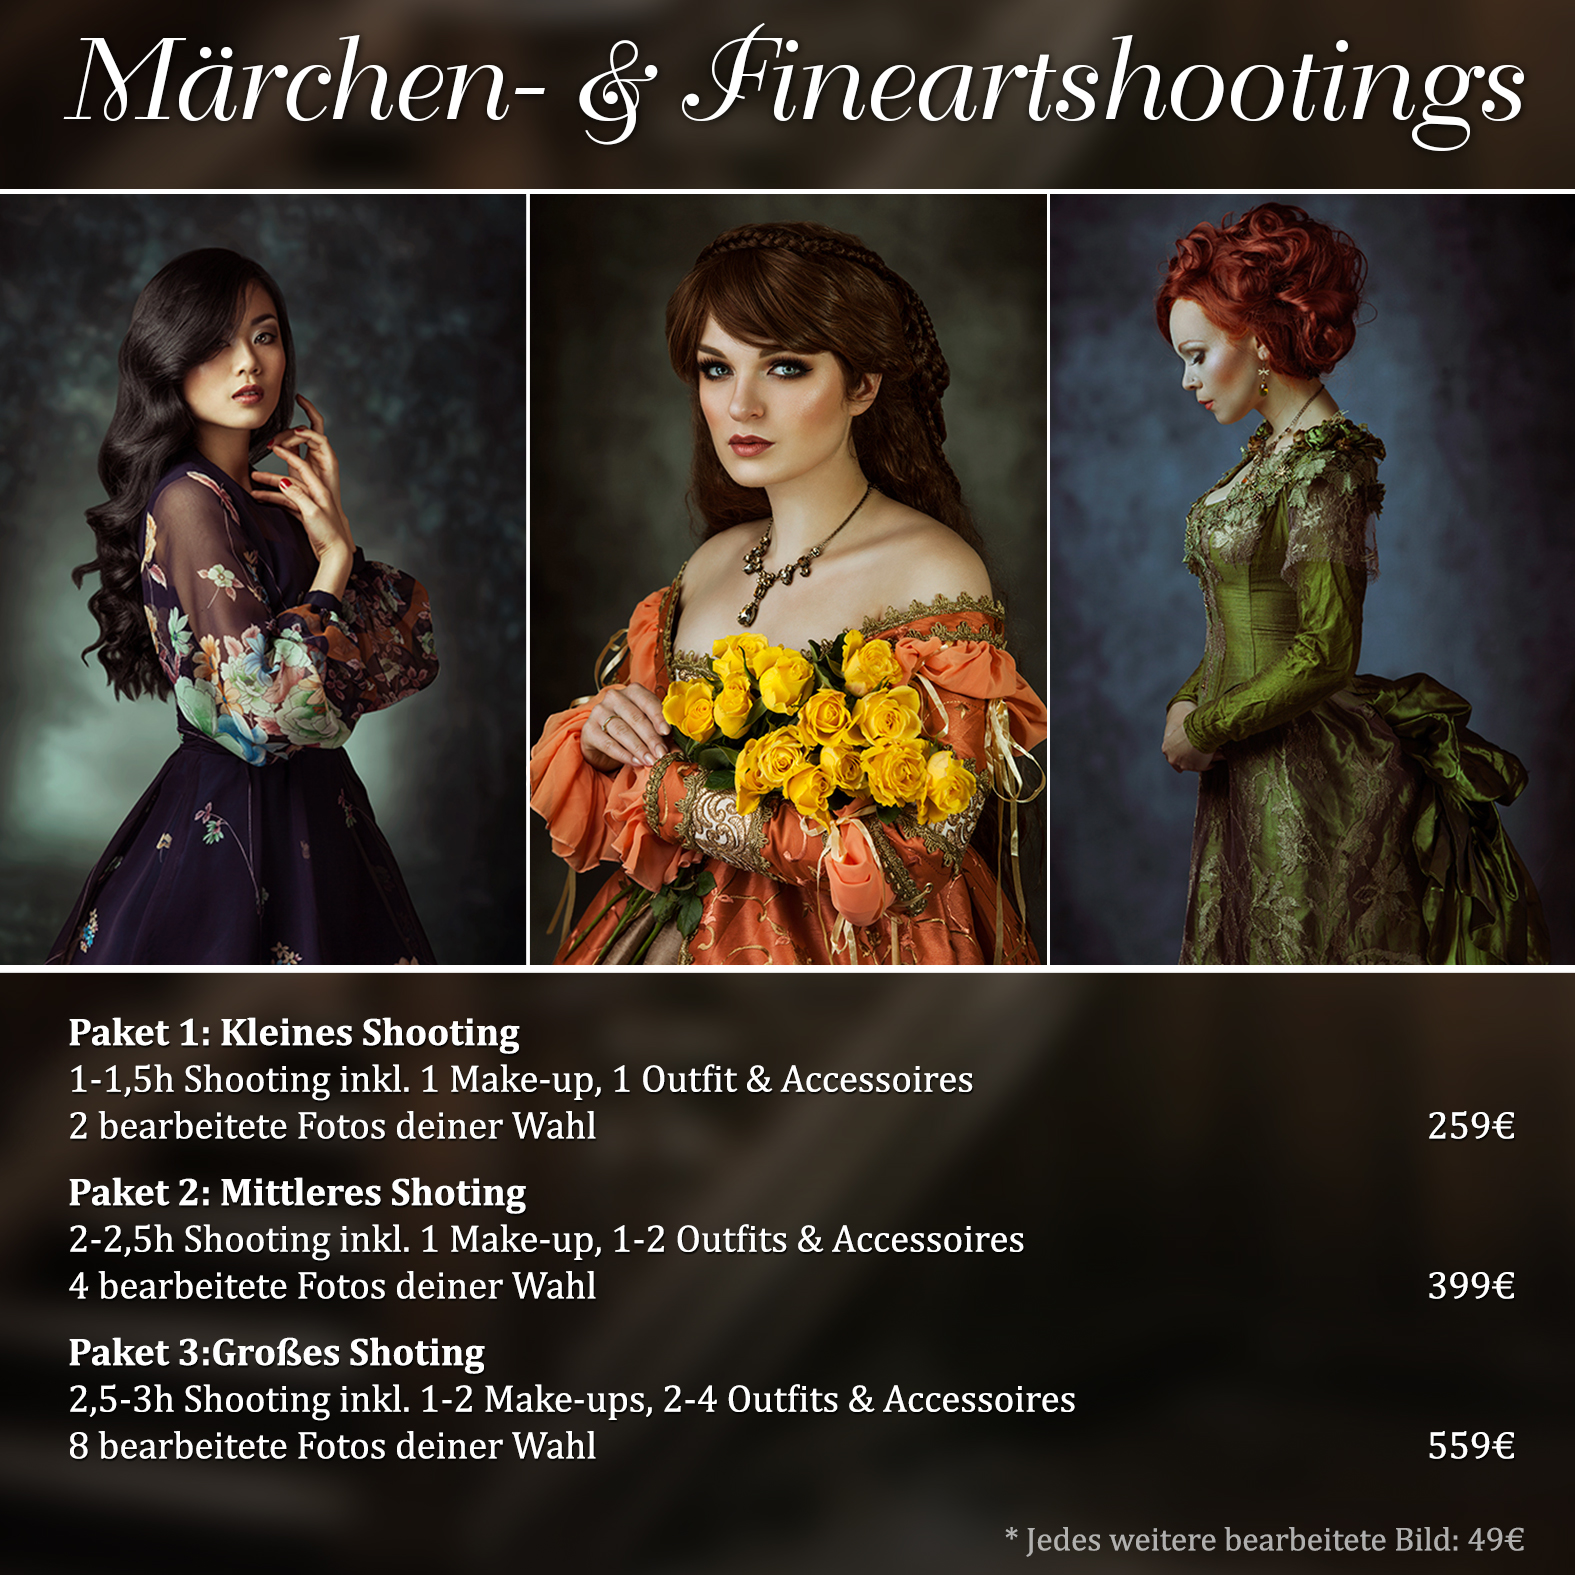 Märchen Fantasy Beauty Fineart Shooting